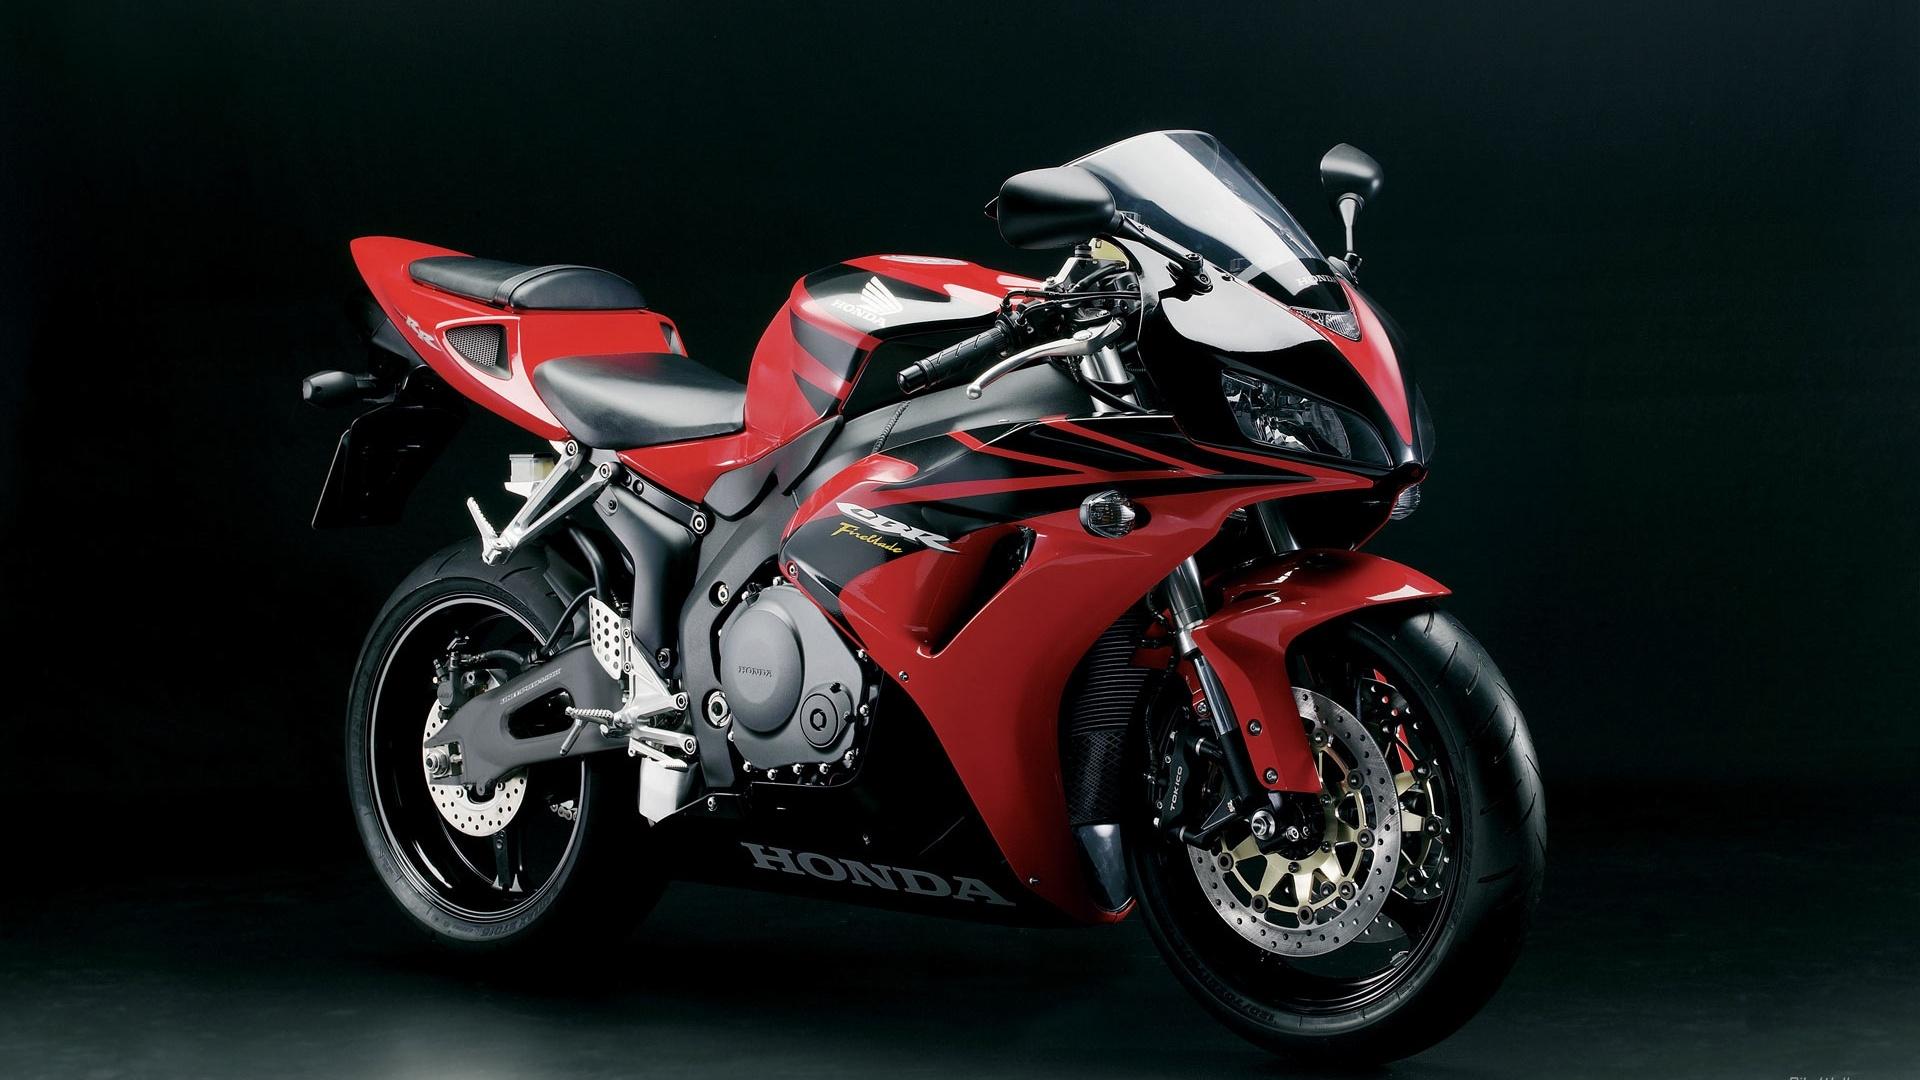 Wallpaper moto hd gratuit t l charger sur ngn mag - Image moto sportive ...